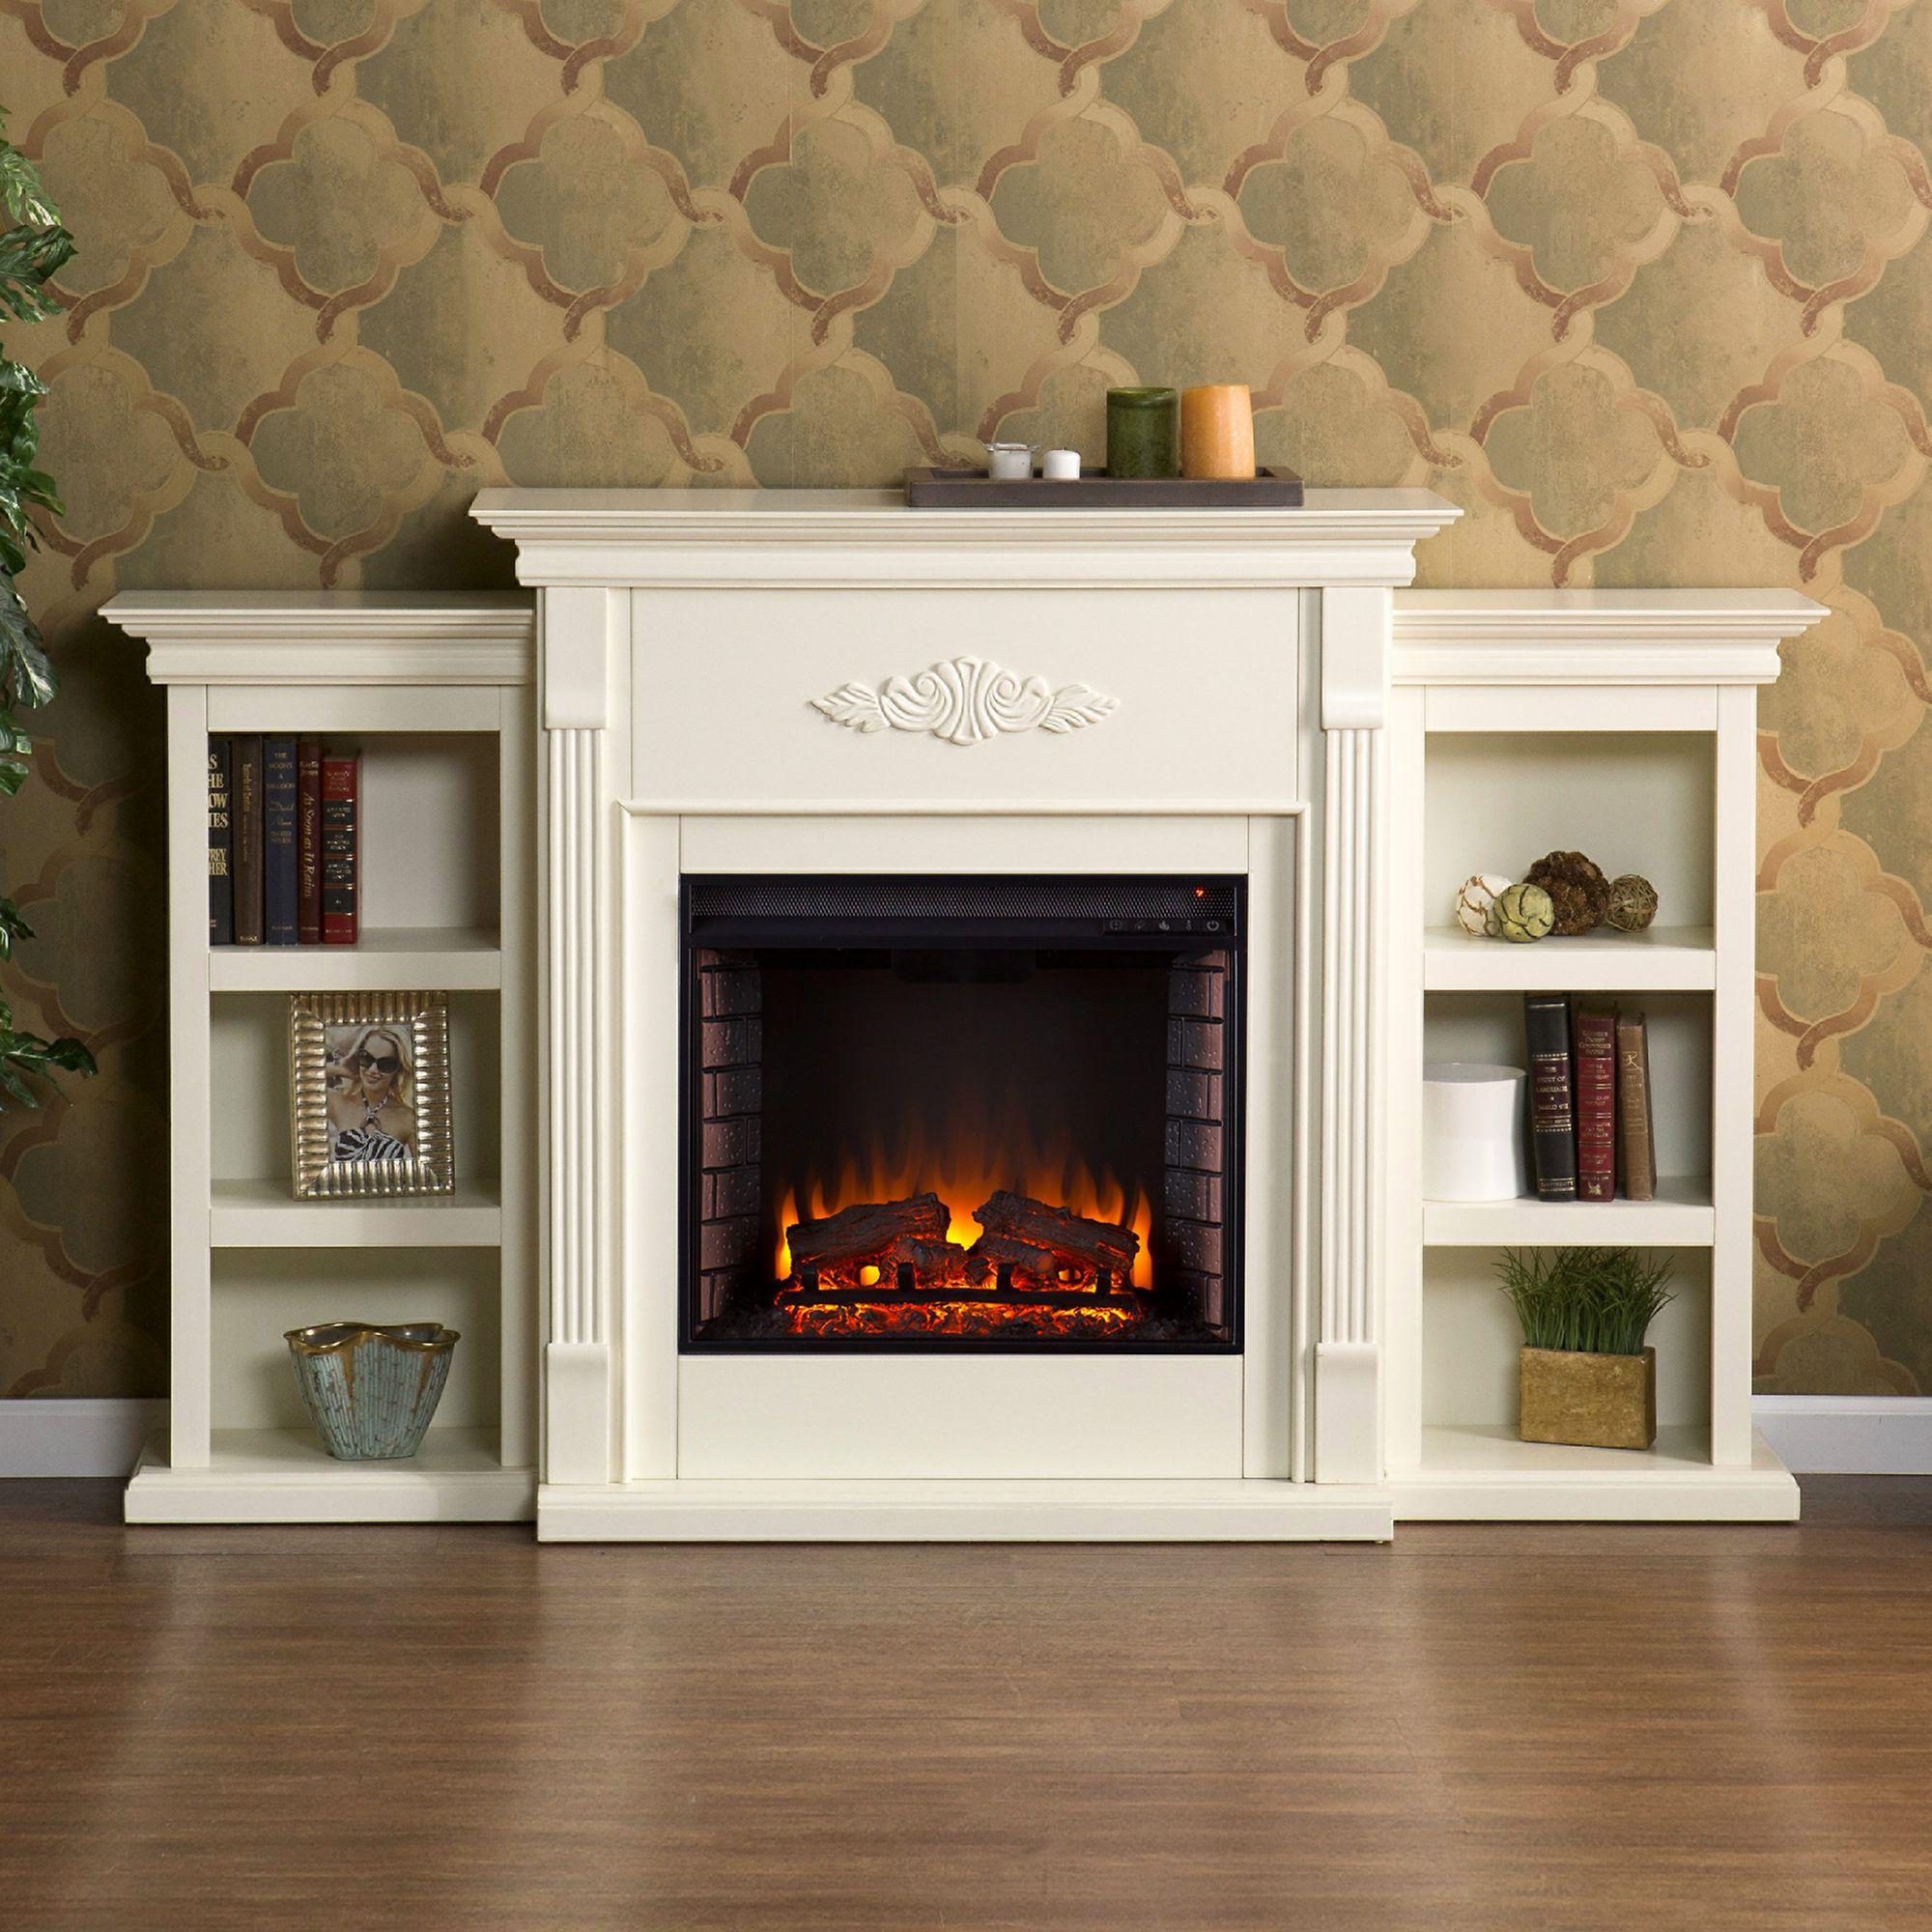 Electric Fireplace Bookcase Inspirational Sei Newport Electric Fireplace with Bookcases Ivory